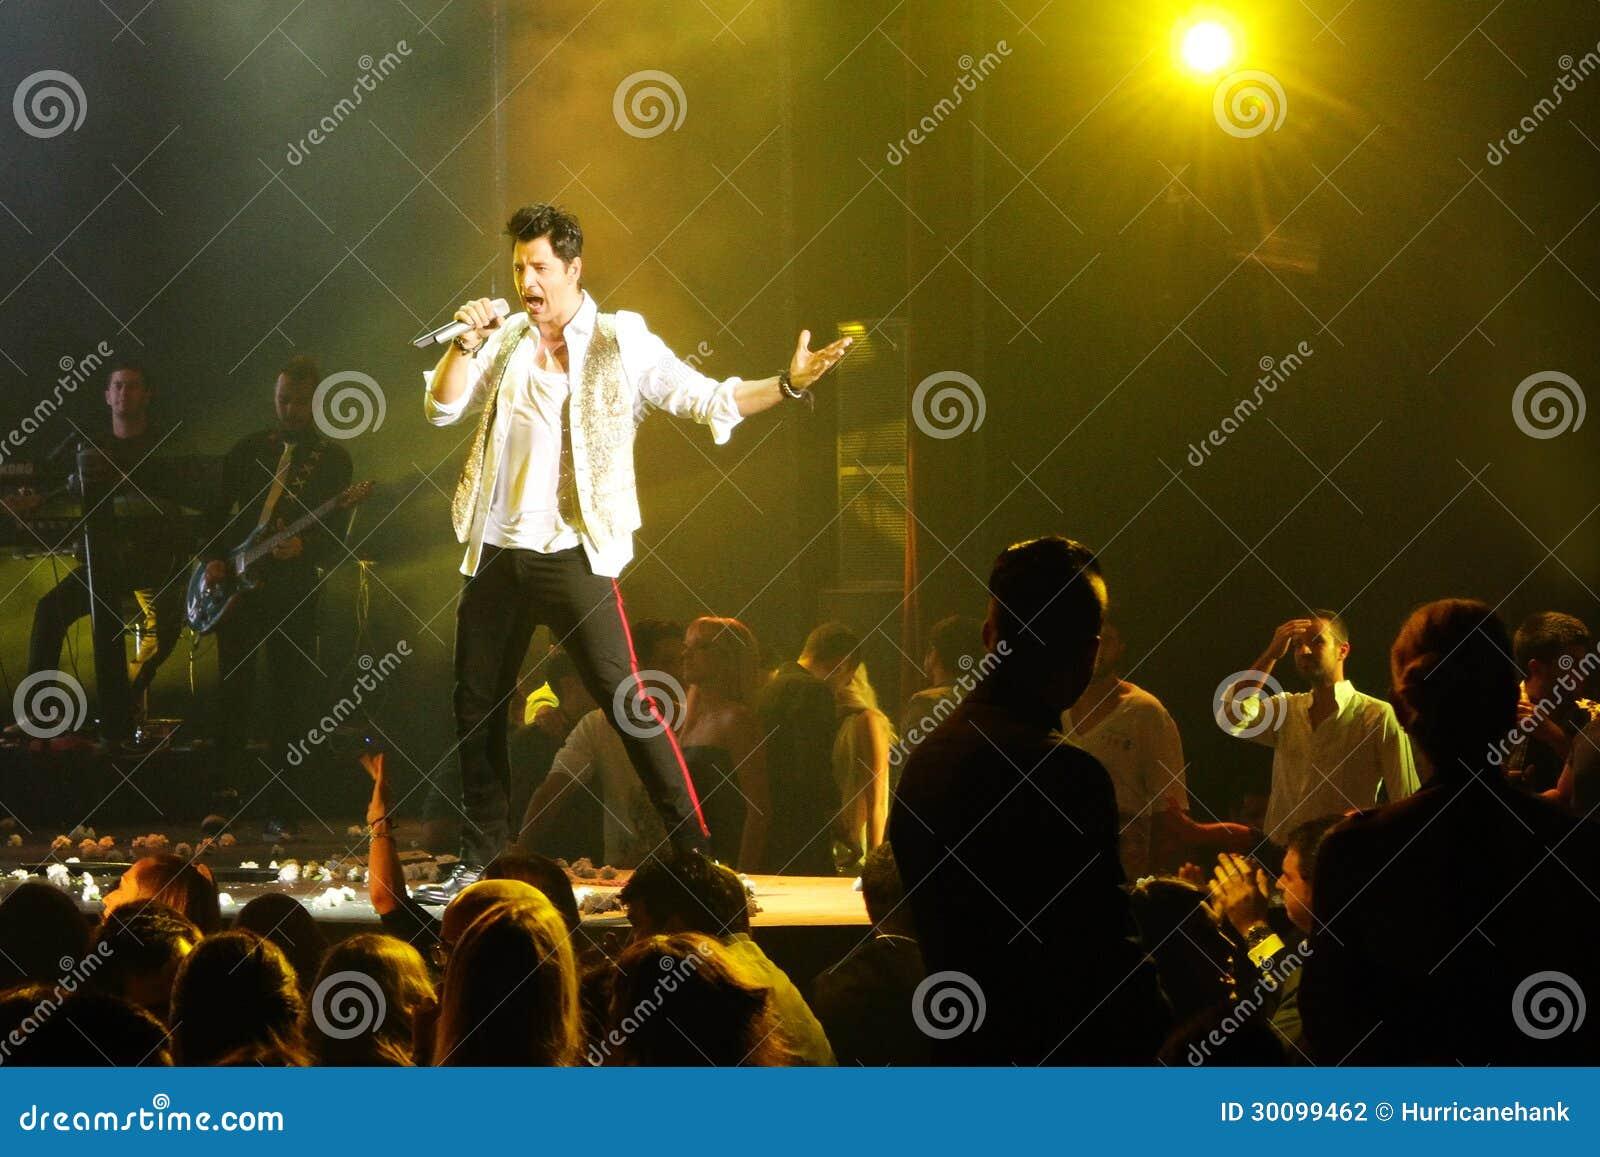 Celebrity singing fails onstage